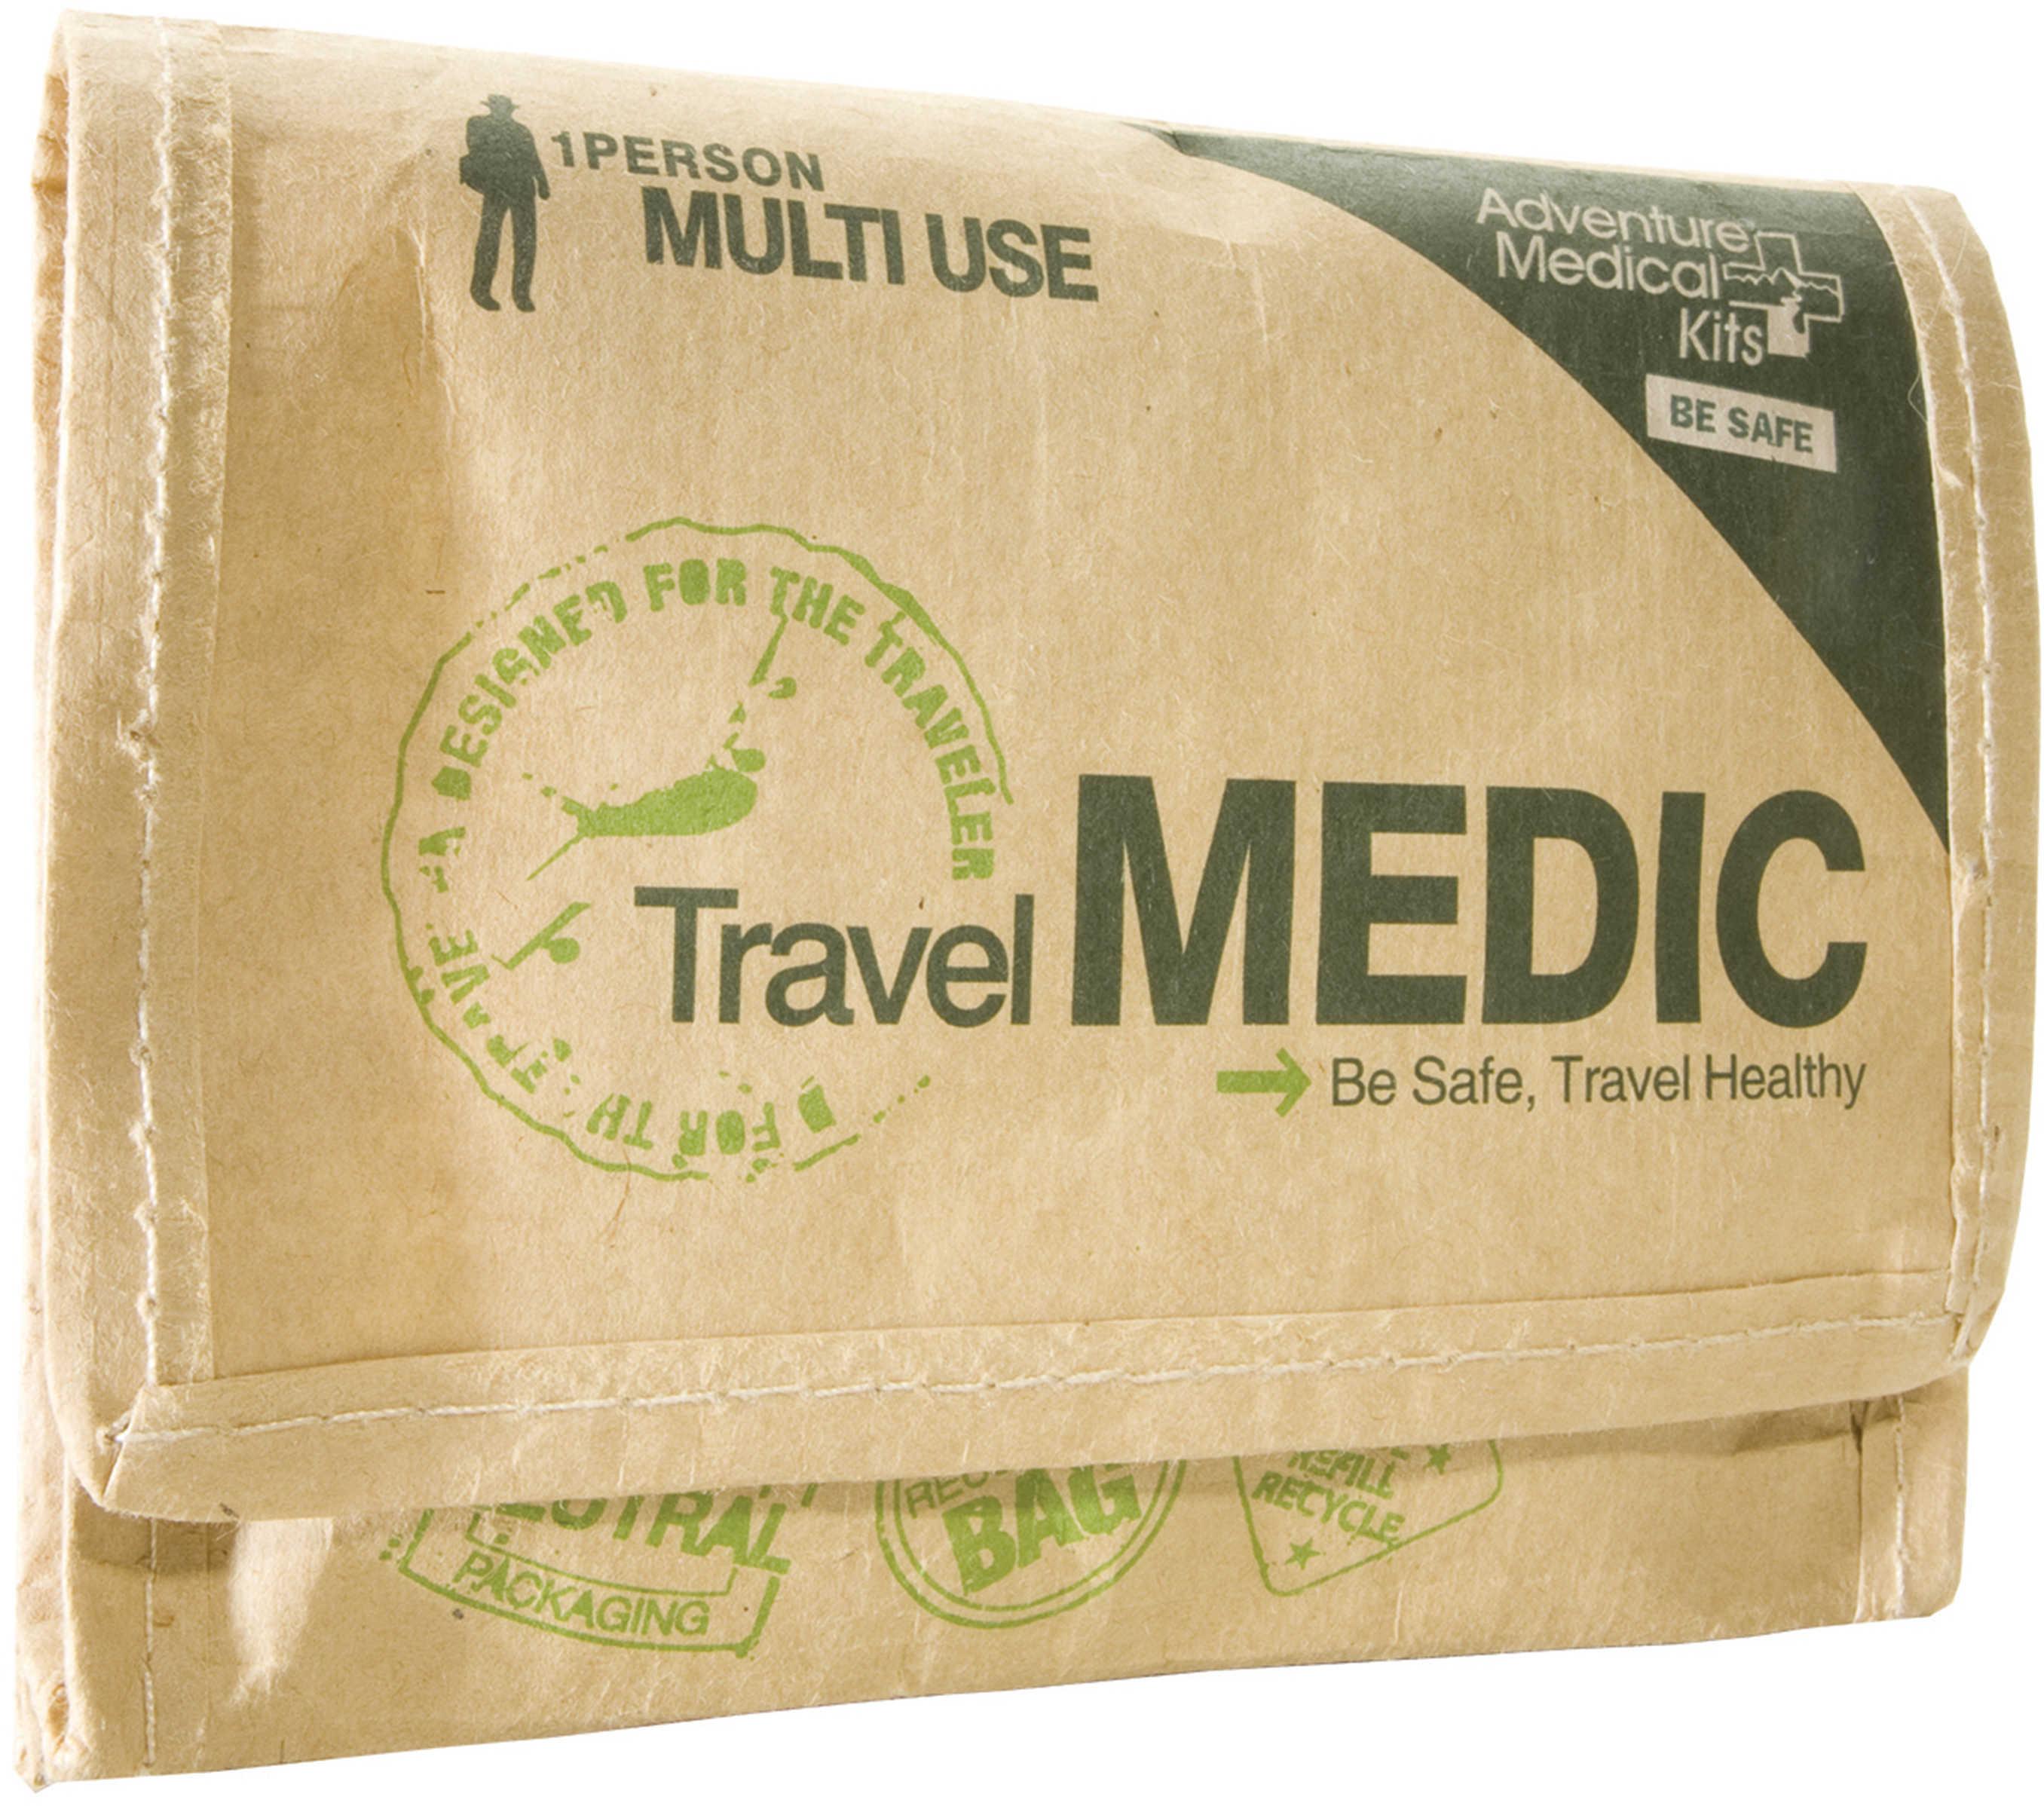 Travel Medic Kpp Edition Md: 0130-0417